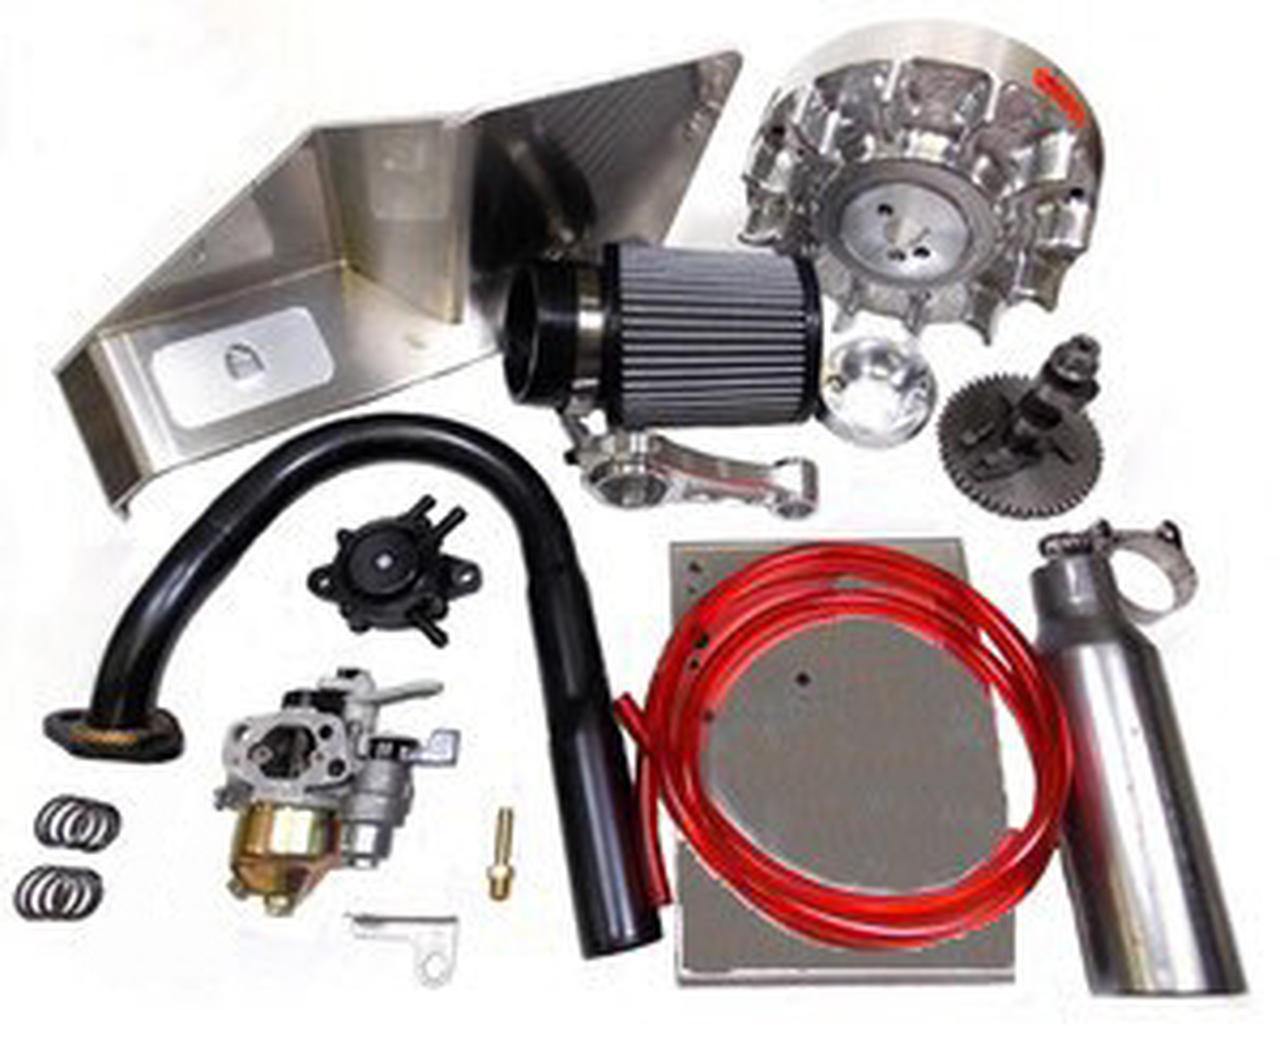 DJ-1024 Builder Prepared Parts Kit